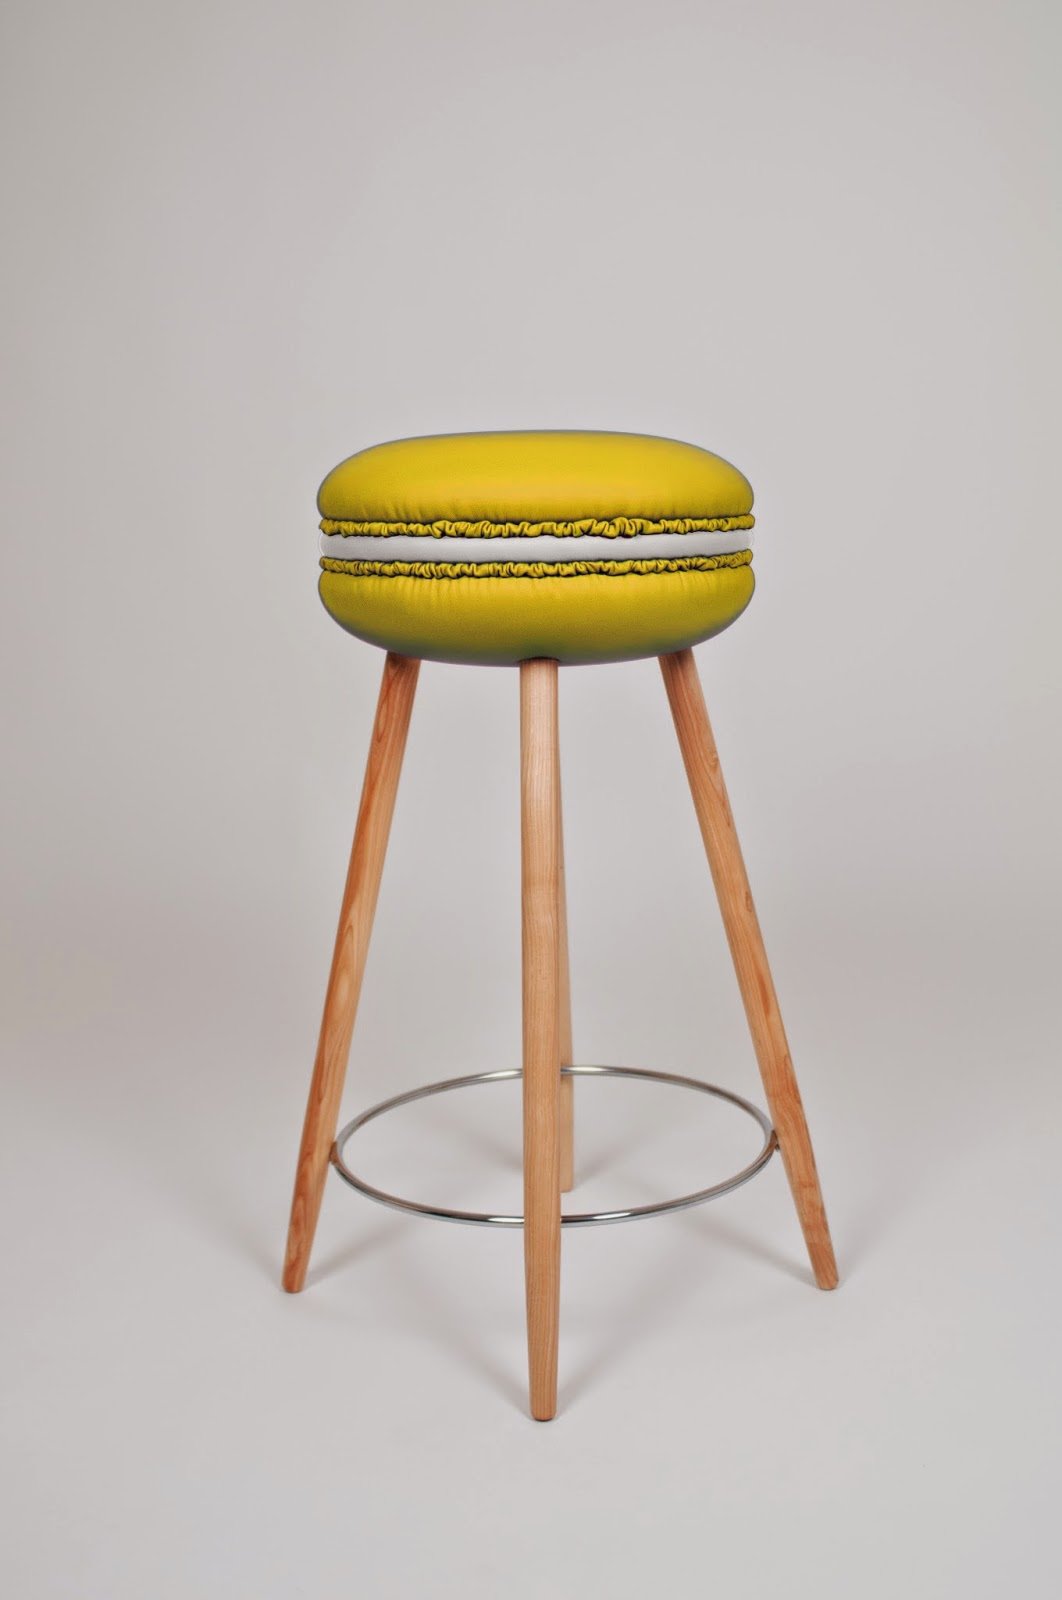 Makastool by Li-Ving ispirati ai pasticcini francesi macaron molto richiesti per ambienti e locali fashion